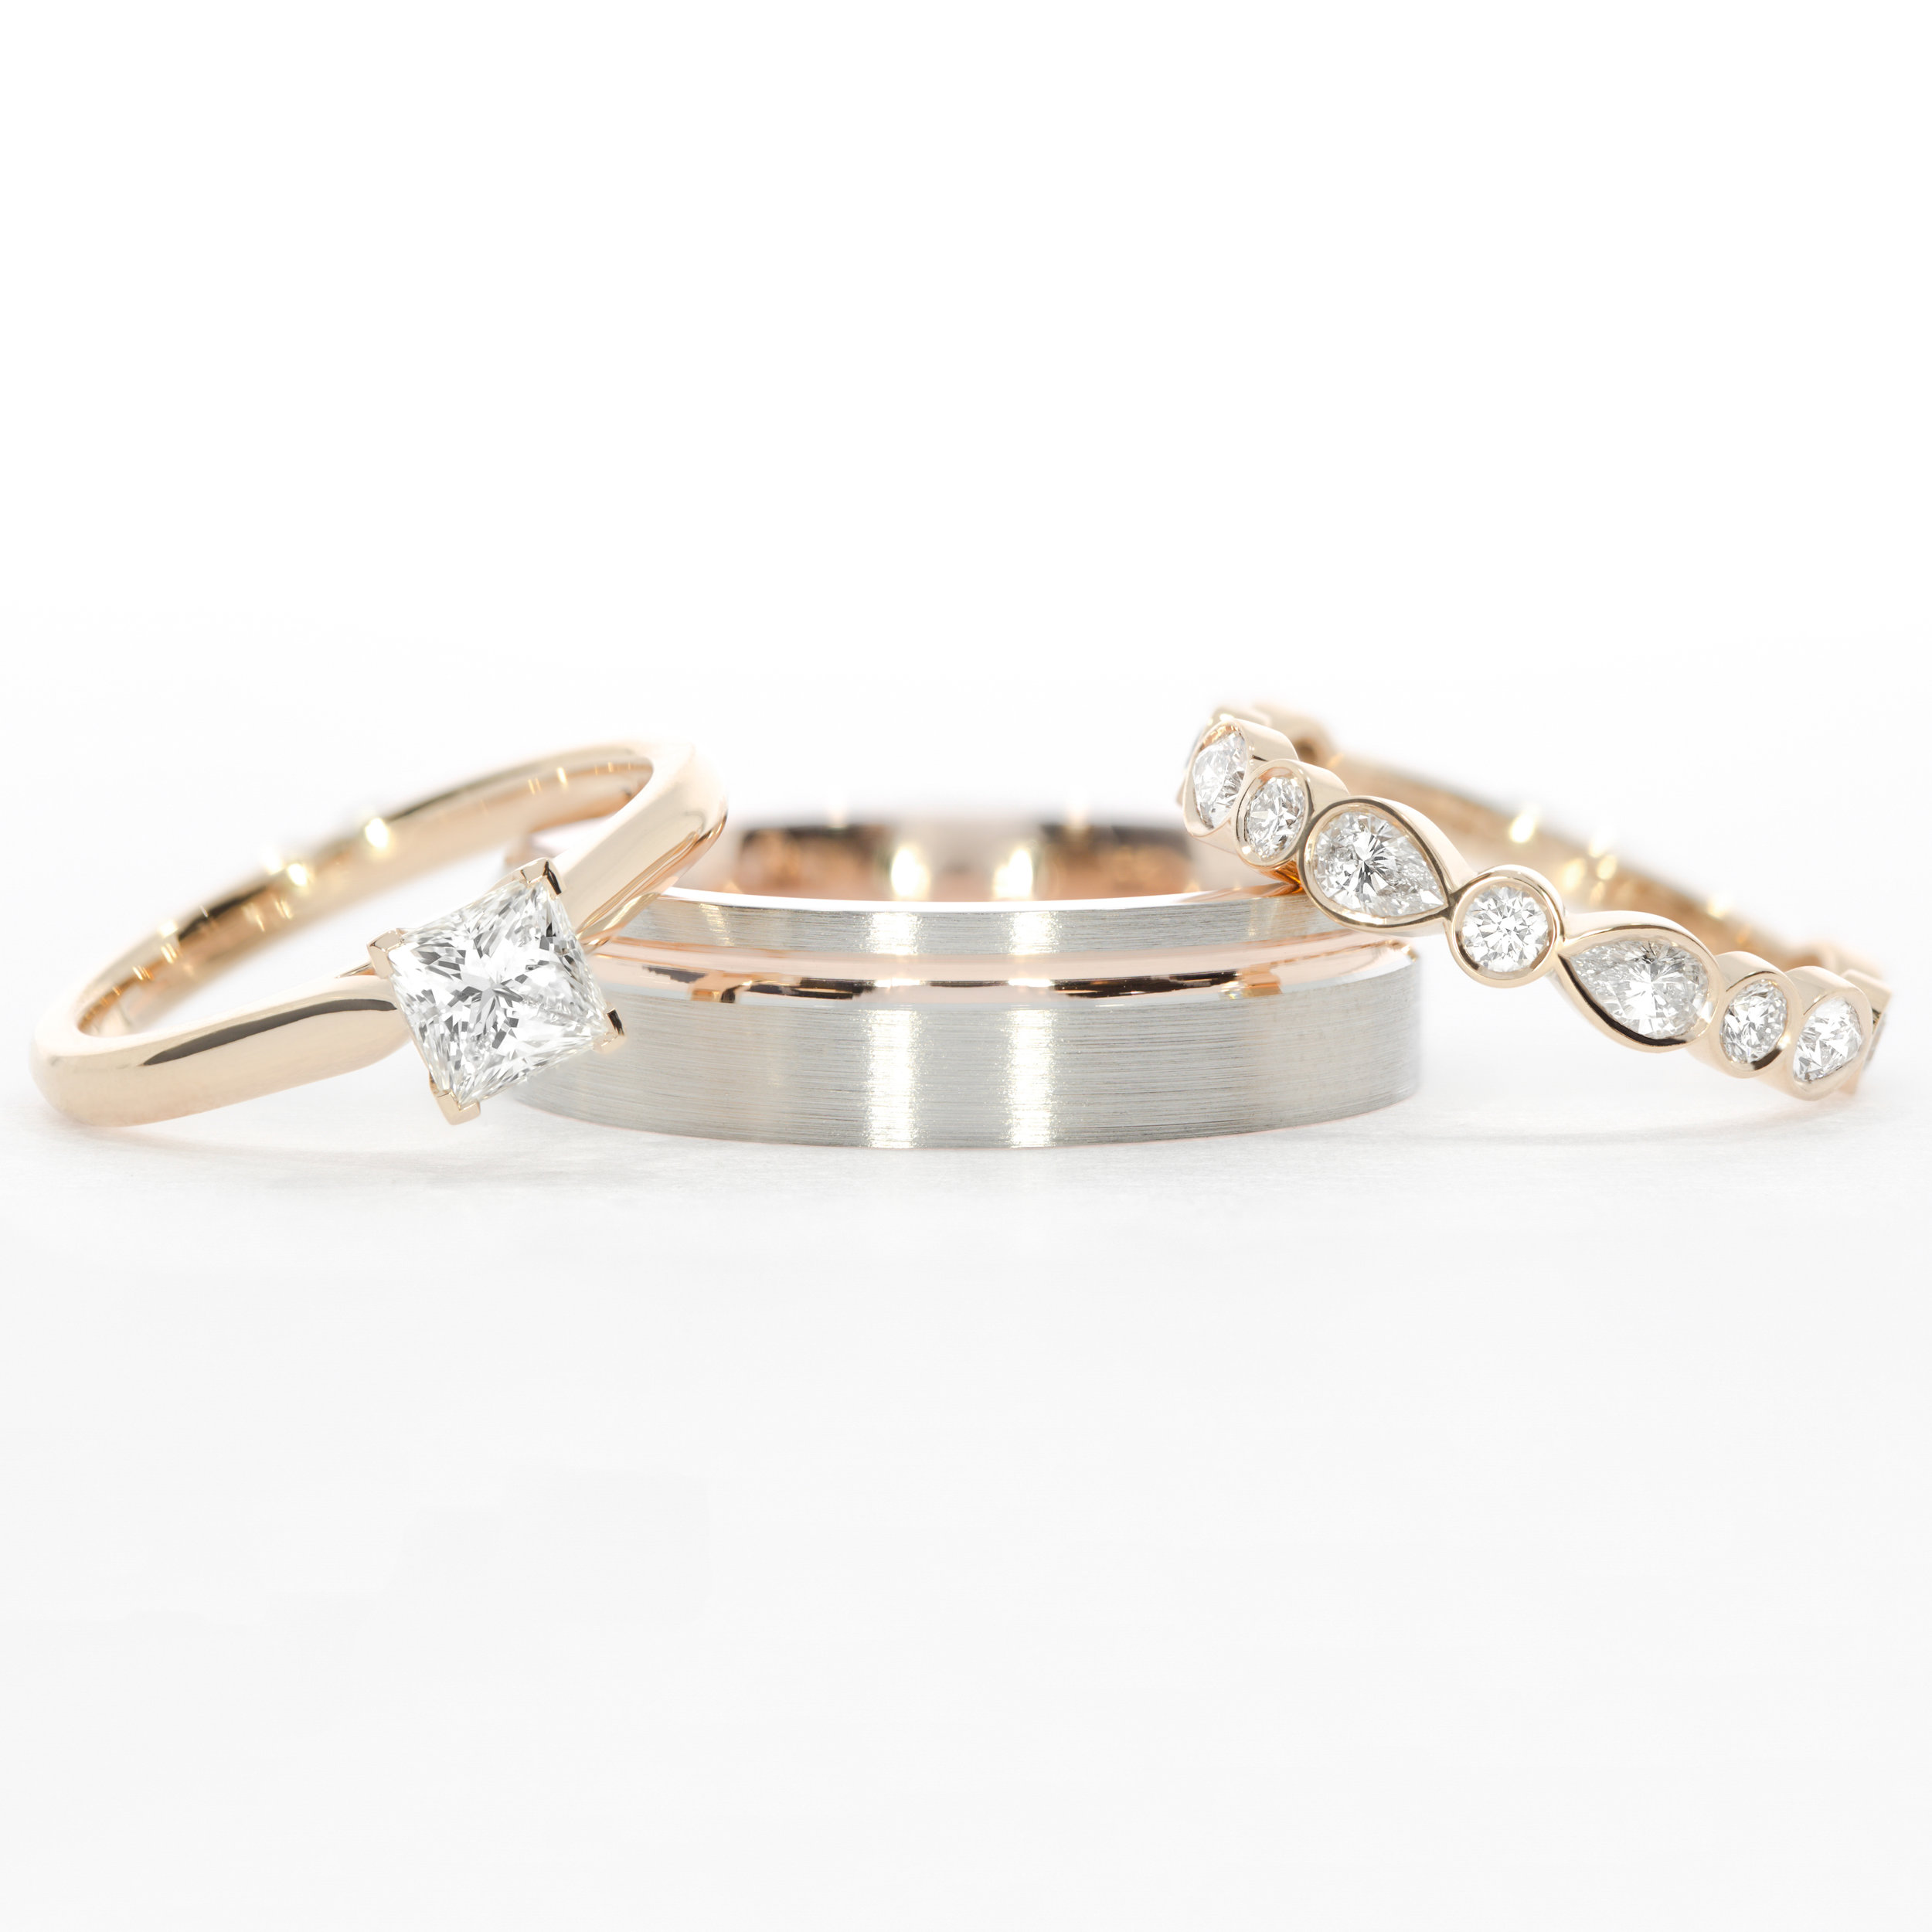 Bespoke trio:  De Carlo princess cut solitaire ,  Men's platinum & rose gold wedding band  and  Women's Montez pear & round diamond wedding ring